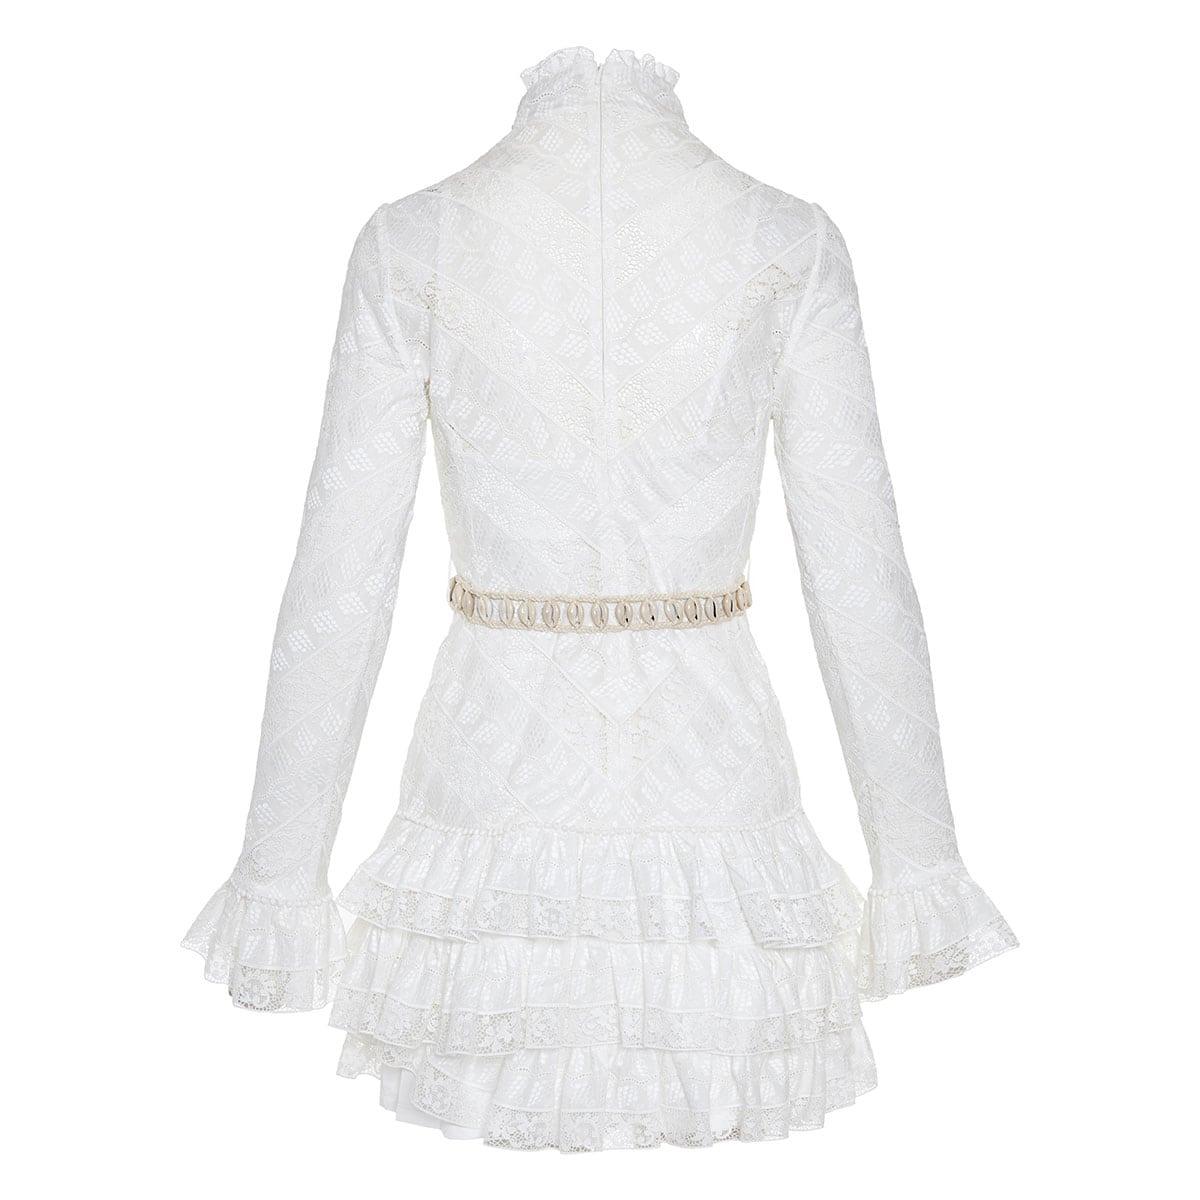 Veneto Perennial lace mini dress